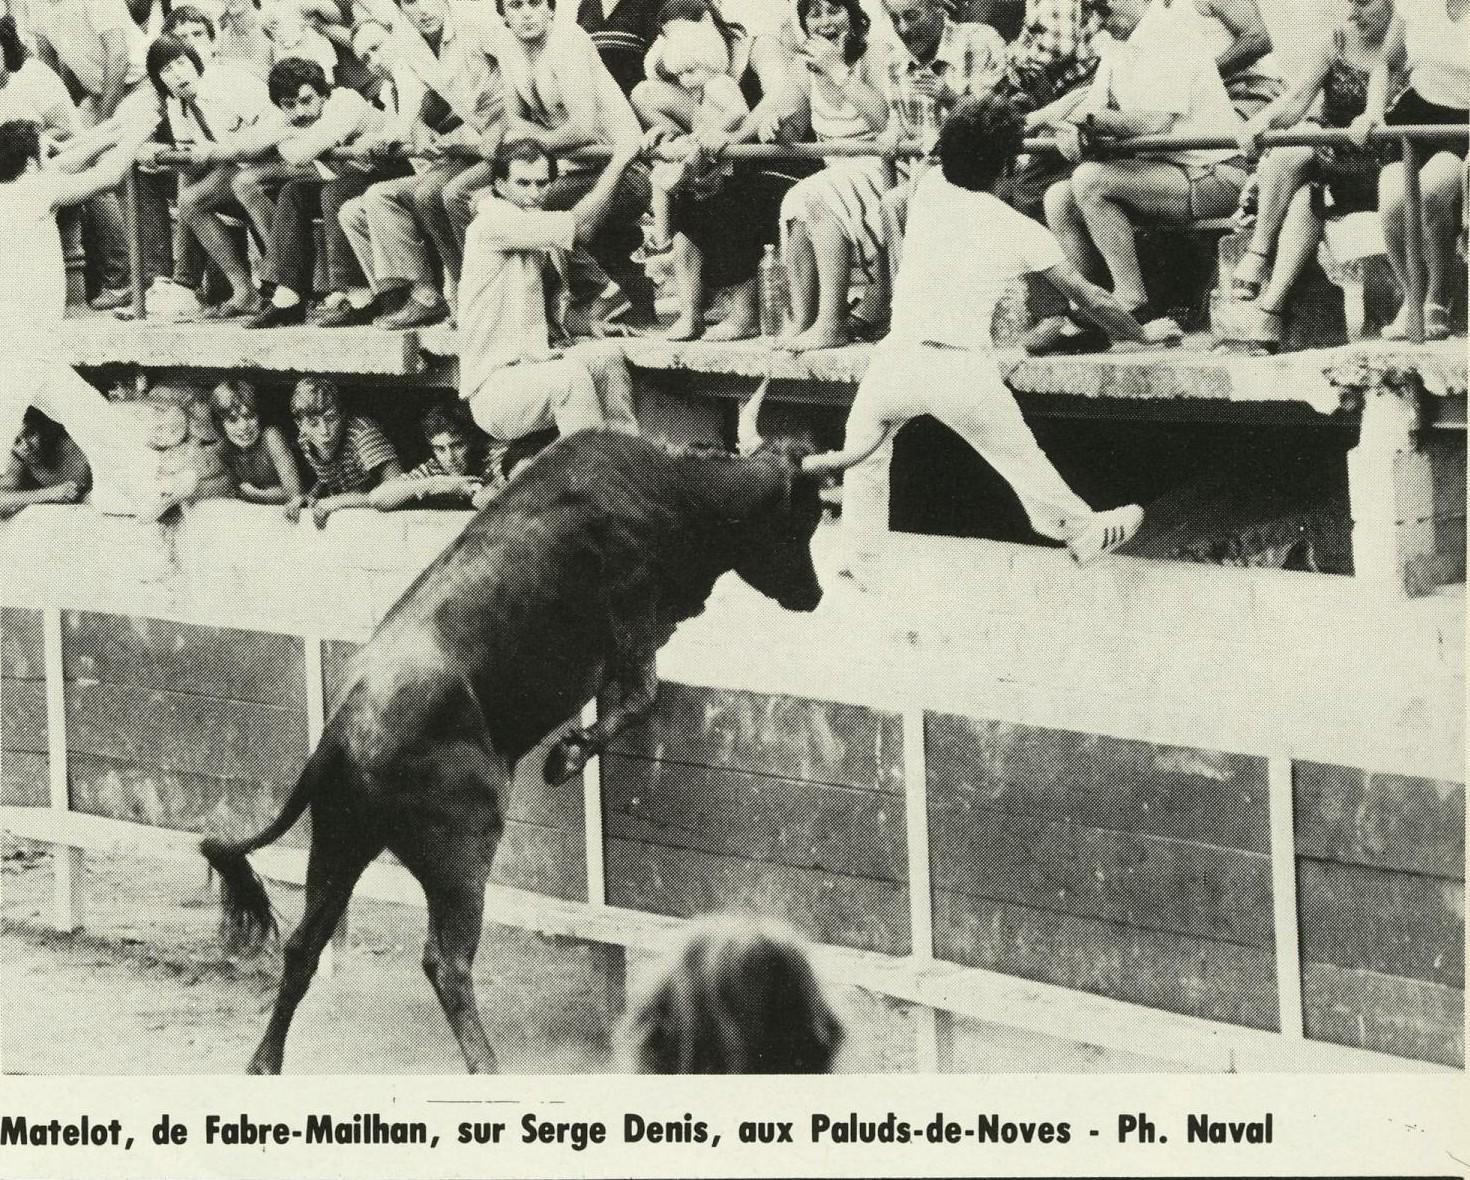 Matelot f mailhan s denis 1983